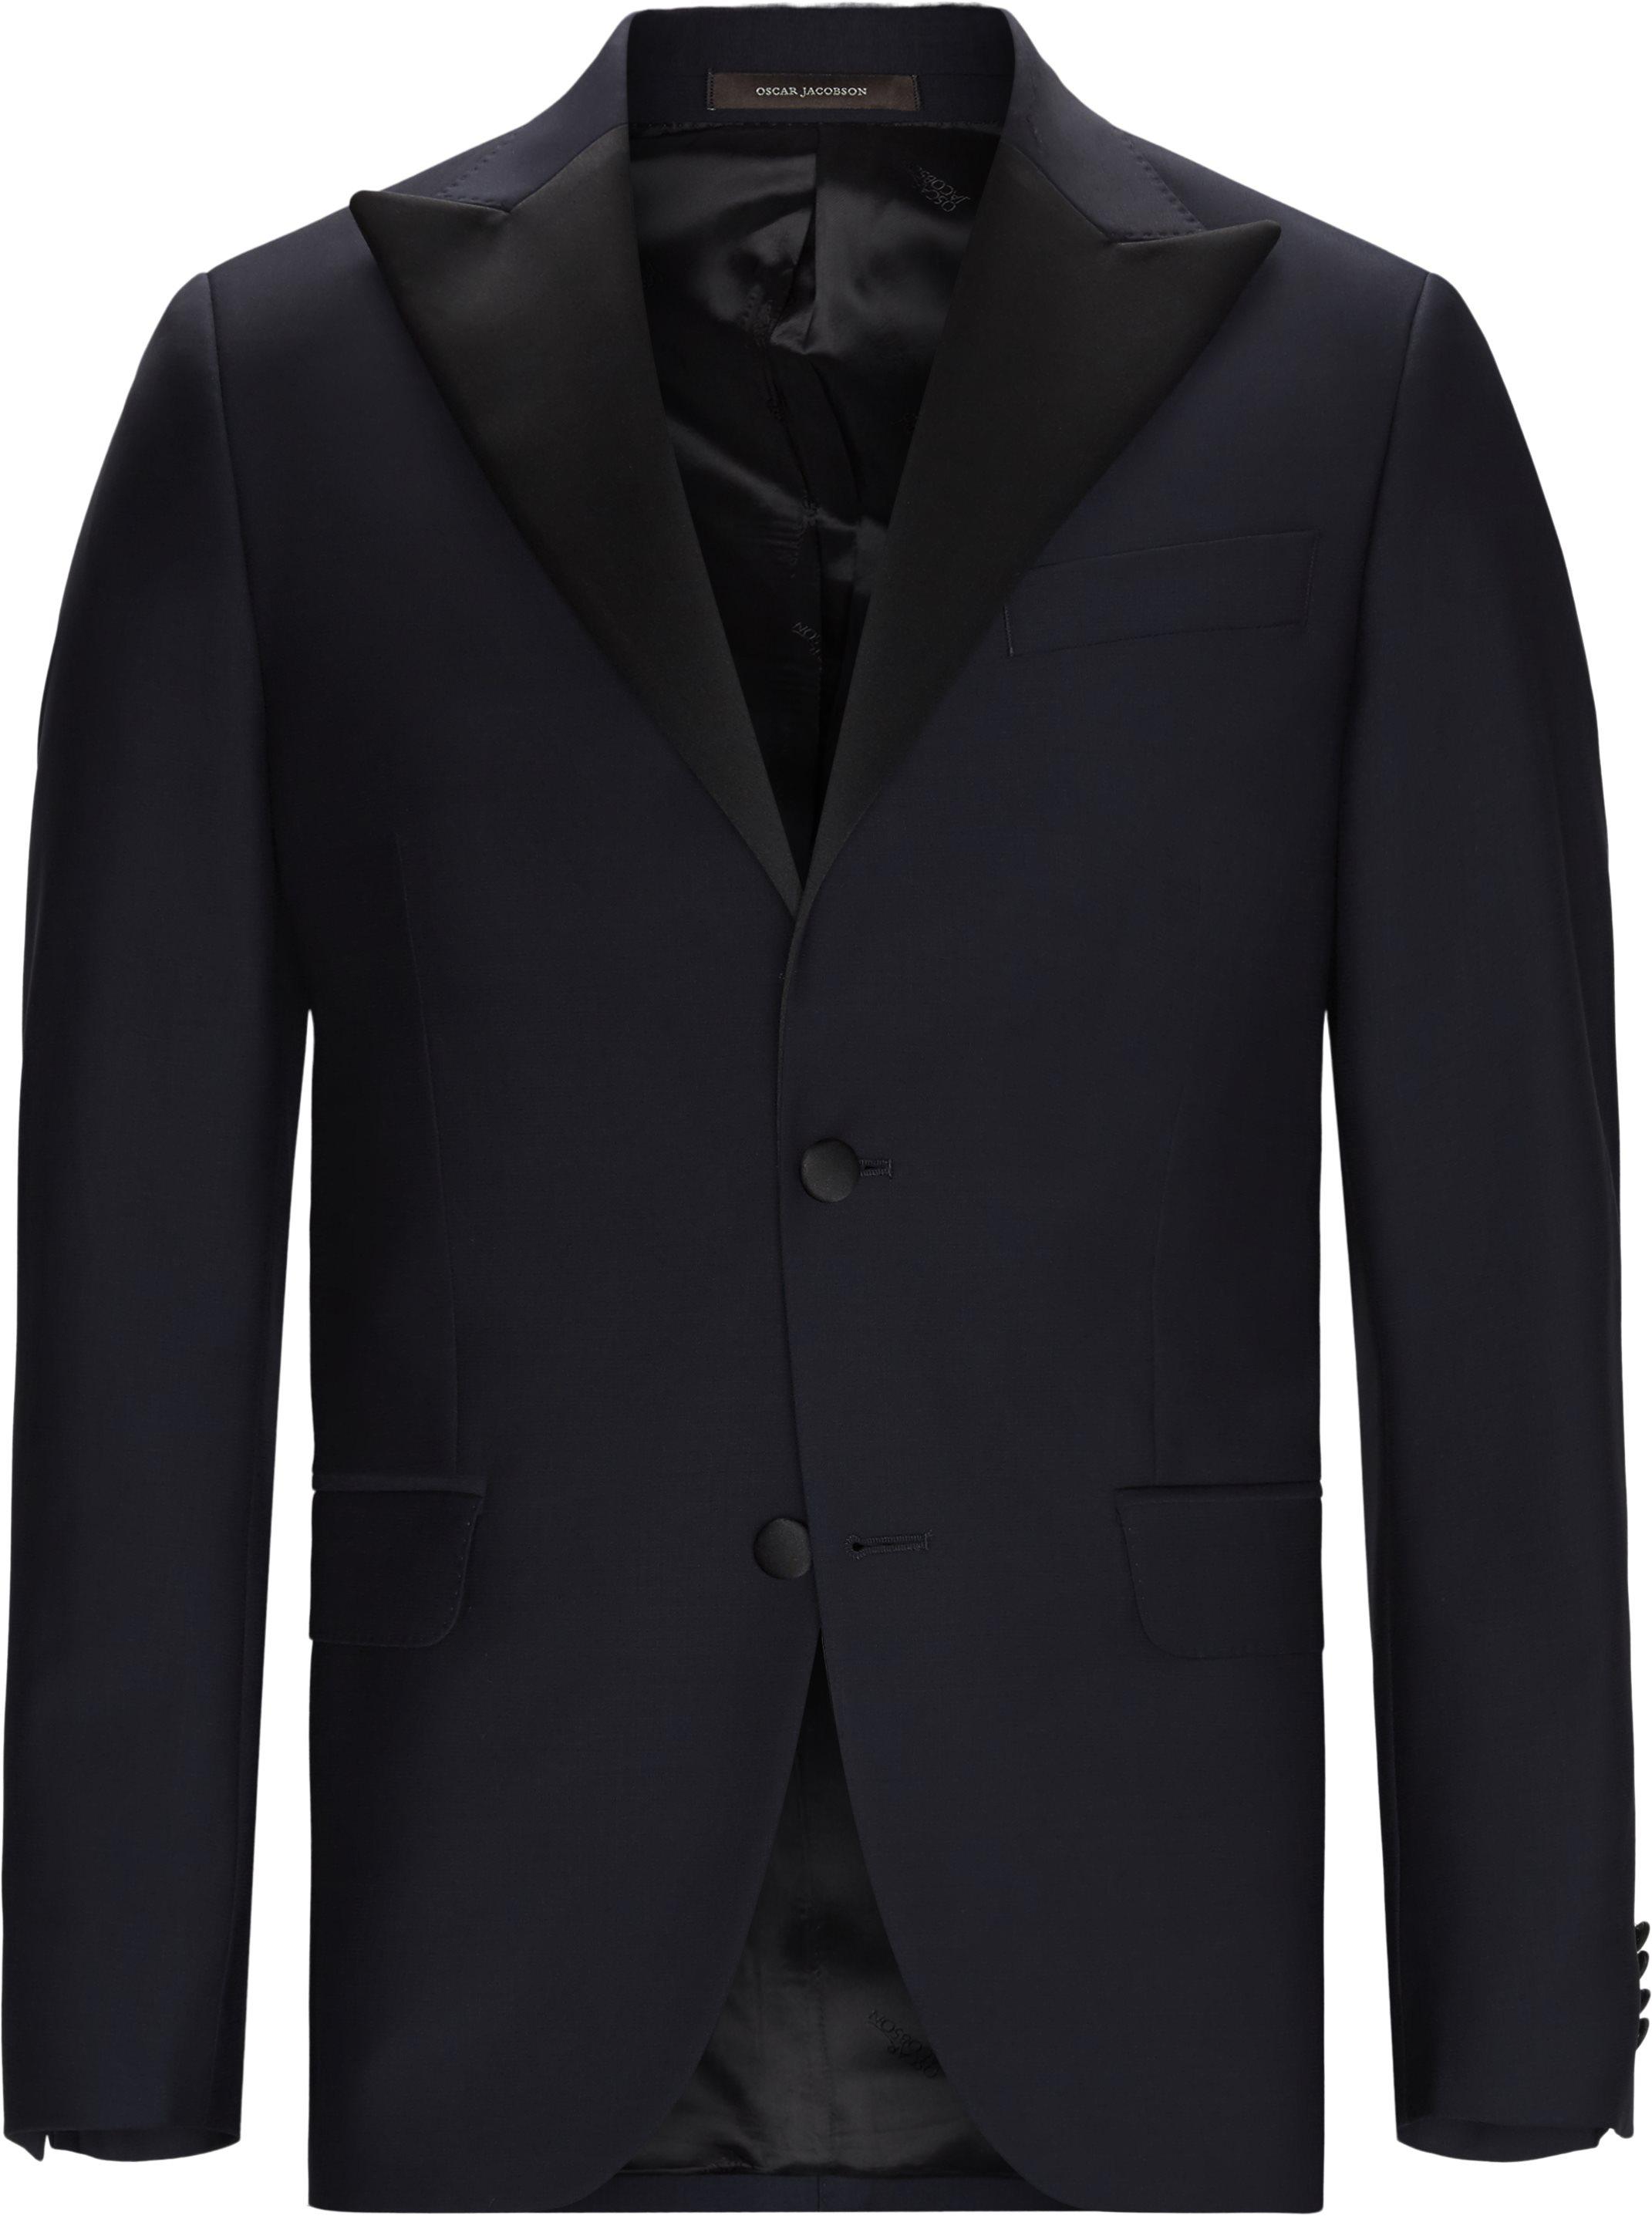 Blazers - Regular fit - Blue